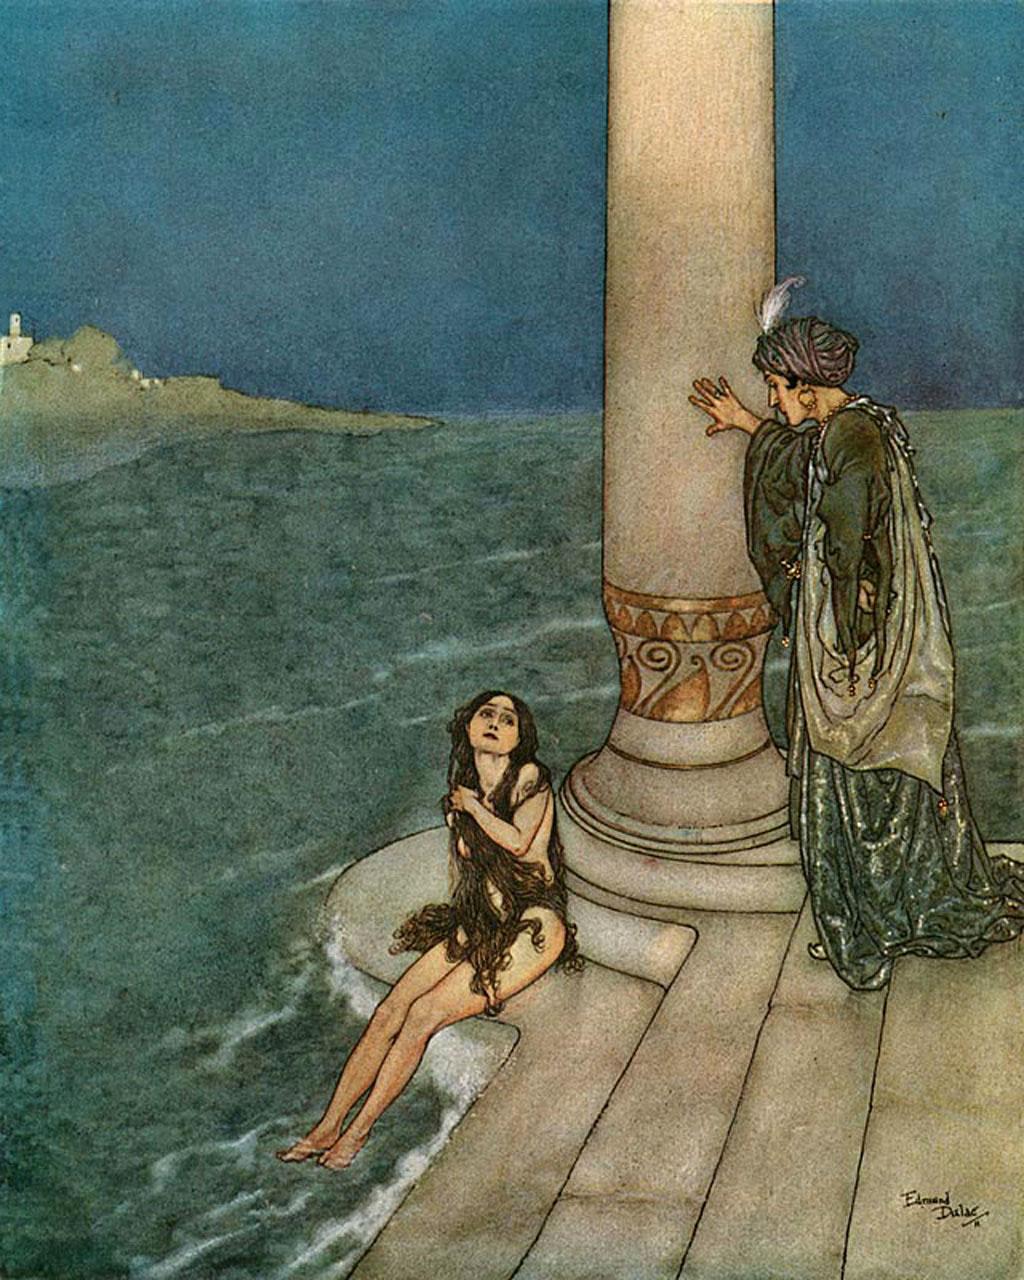 The Little Mermaid, Edmund Dulac illustration